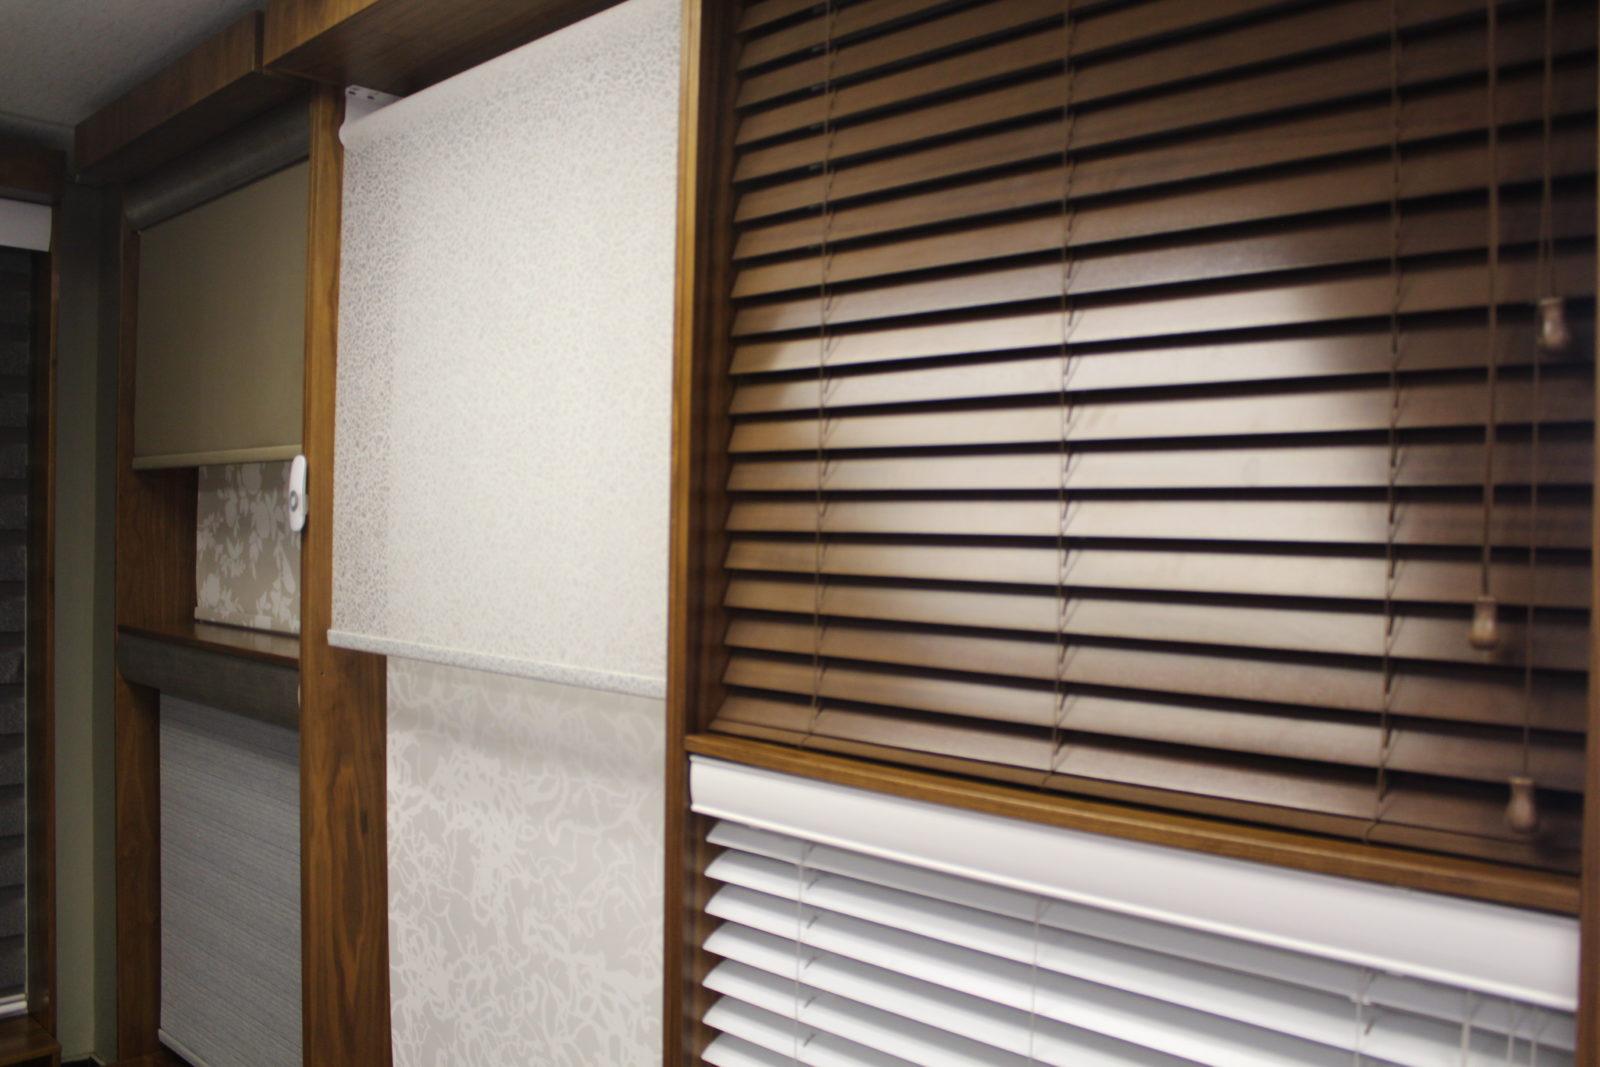 bagless upright vacuum dustingbrush sprint refurbished air cleaner blinds itm hoover